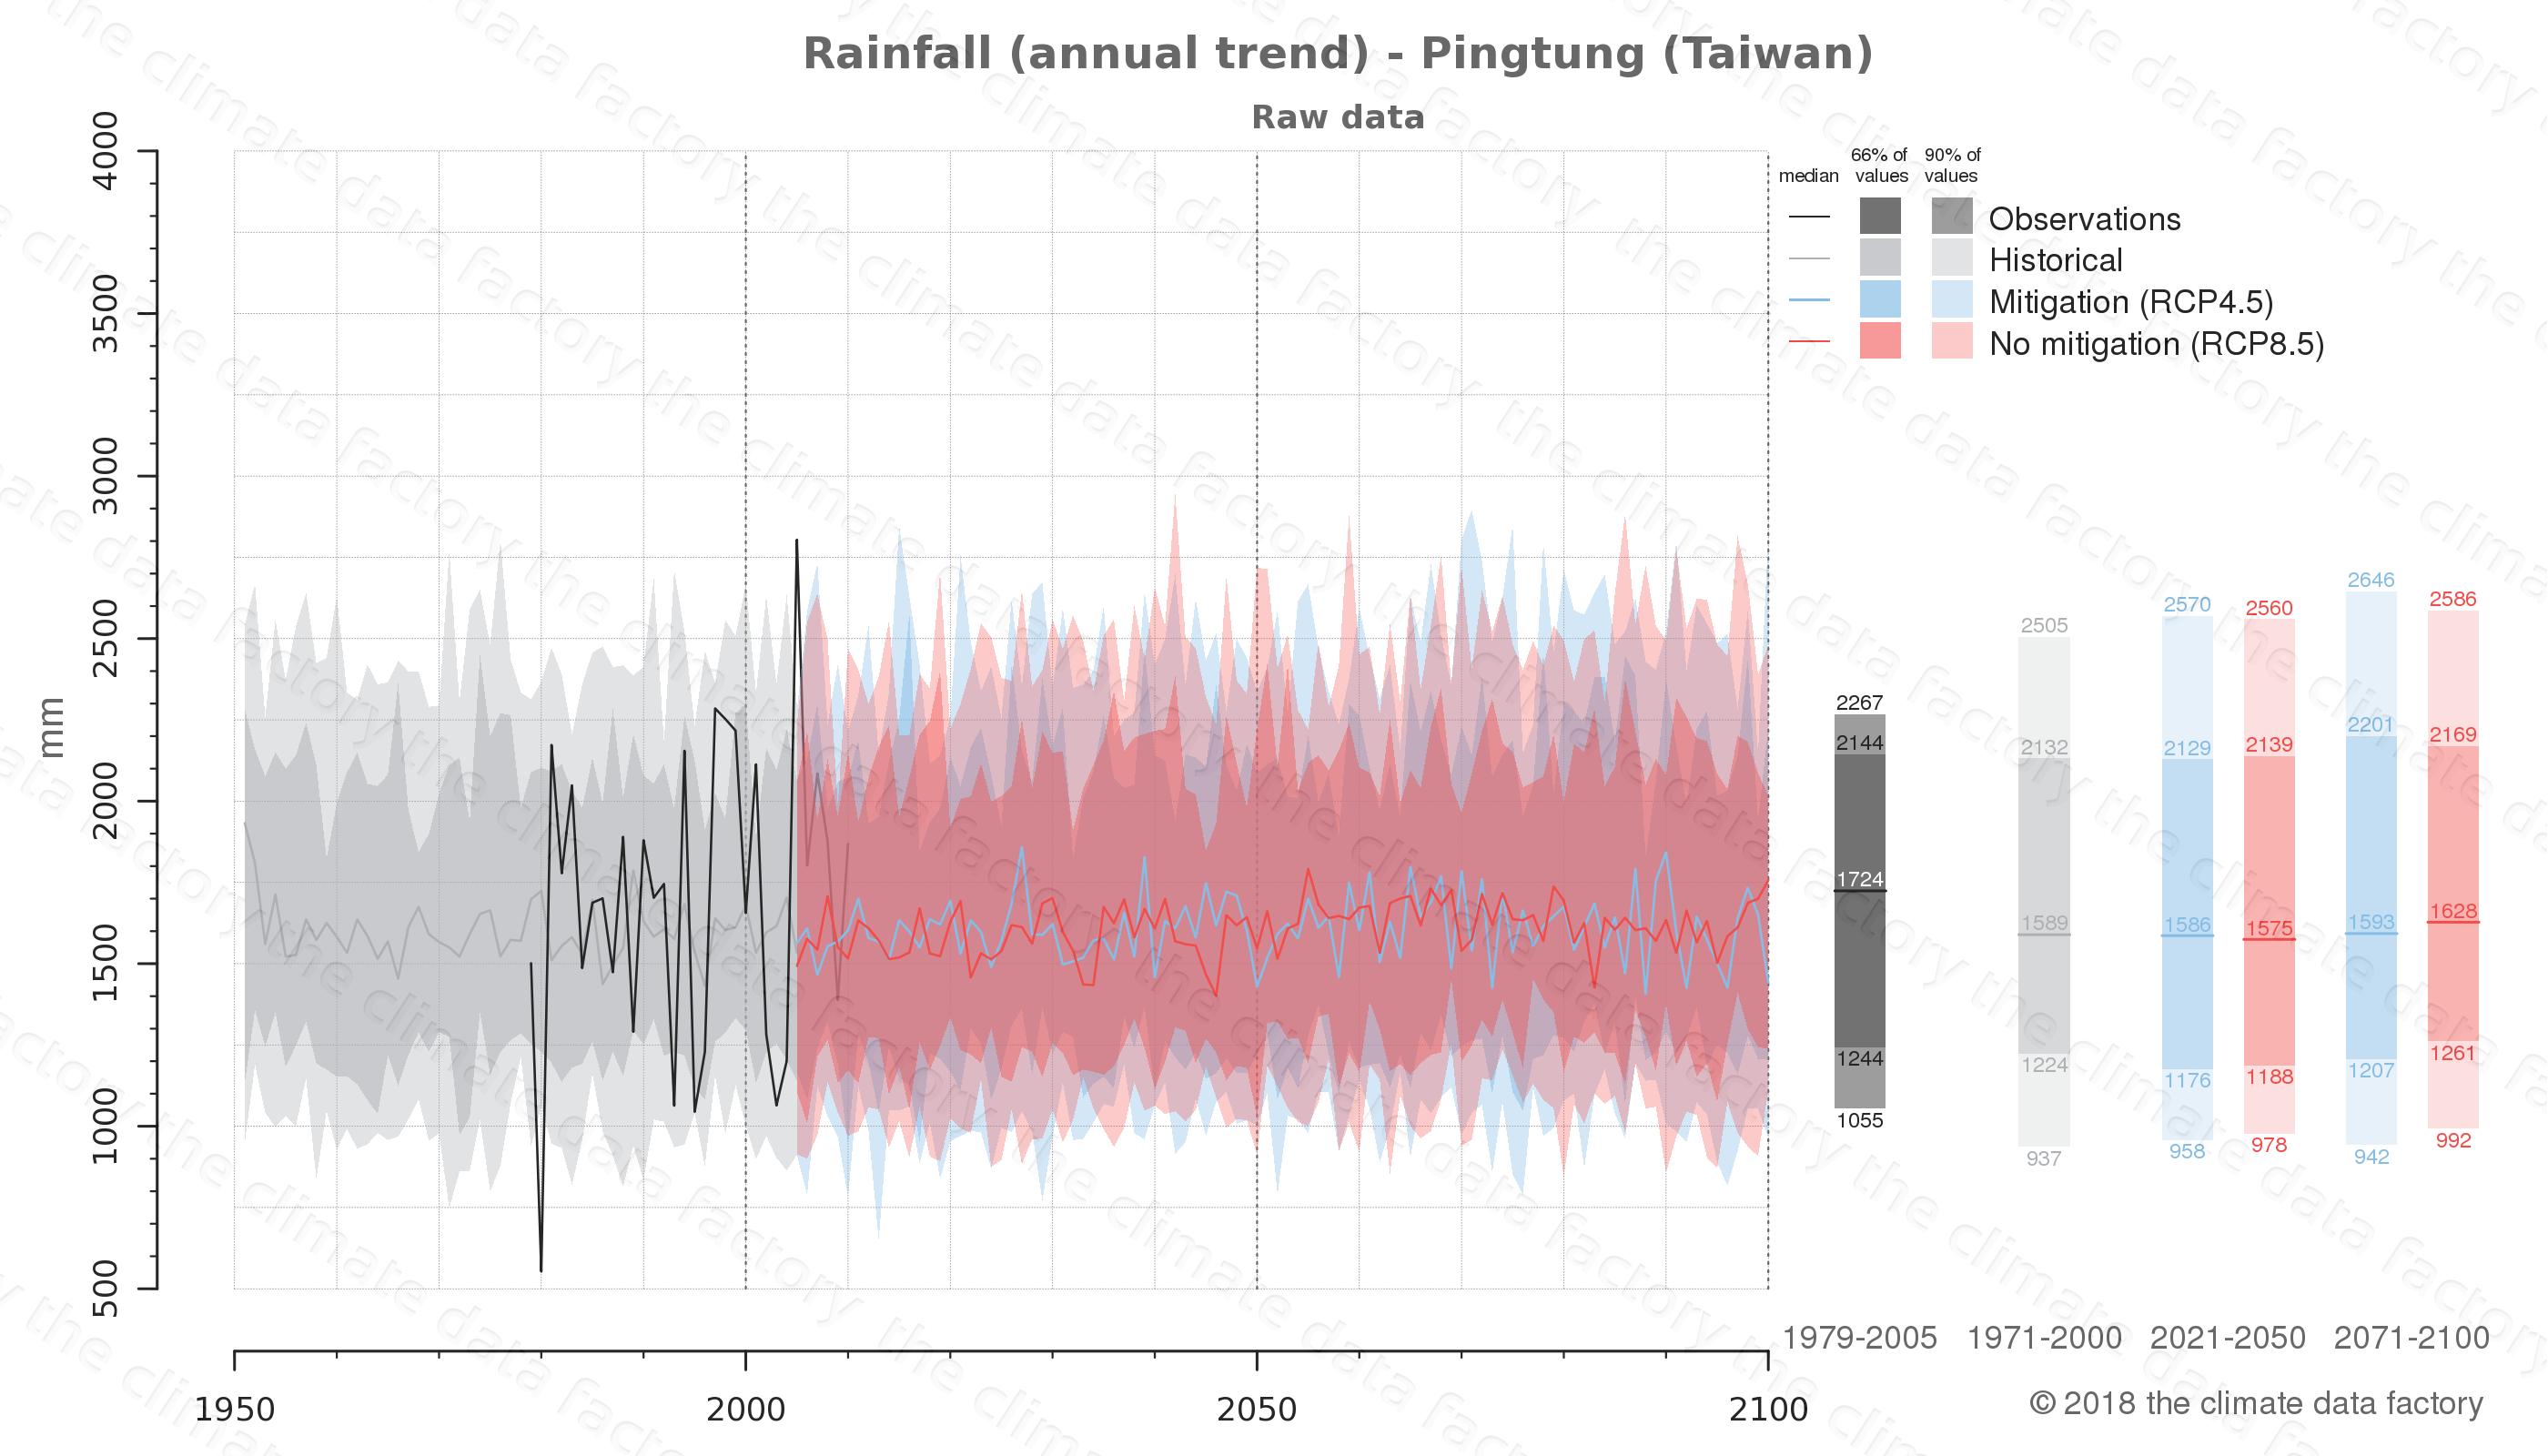 climate change data policy adaptation climate graph city data rainfall pingtung taiwan